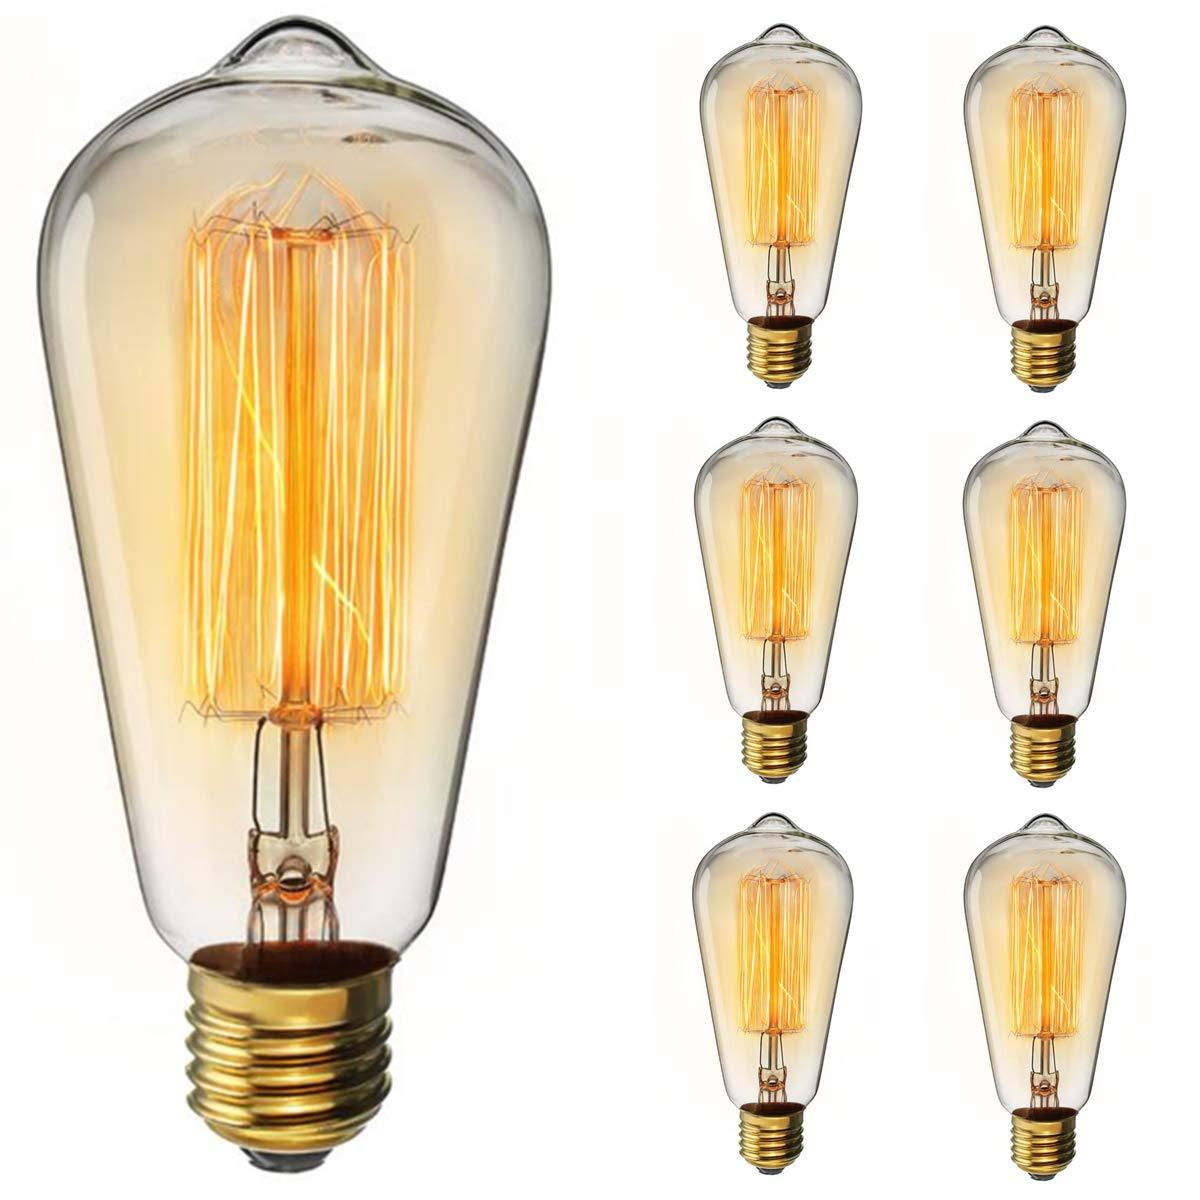 Vintage Edison Bulb KINGSO Dimmable 60W Edison Light Bulb Squirrel Cage Filament Incandescent Antique Light Bulb E26 Base ST64 110V - 6 Pack